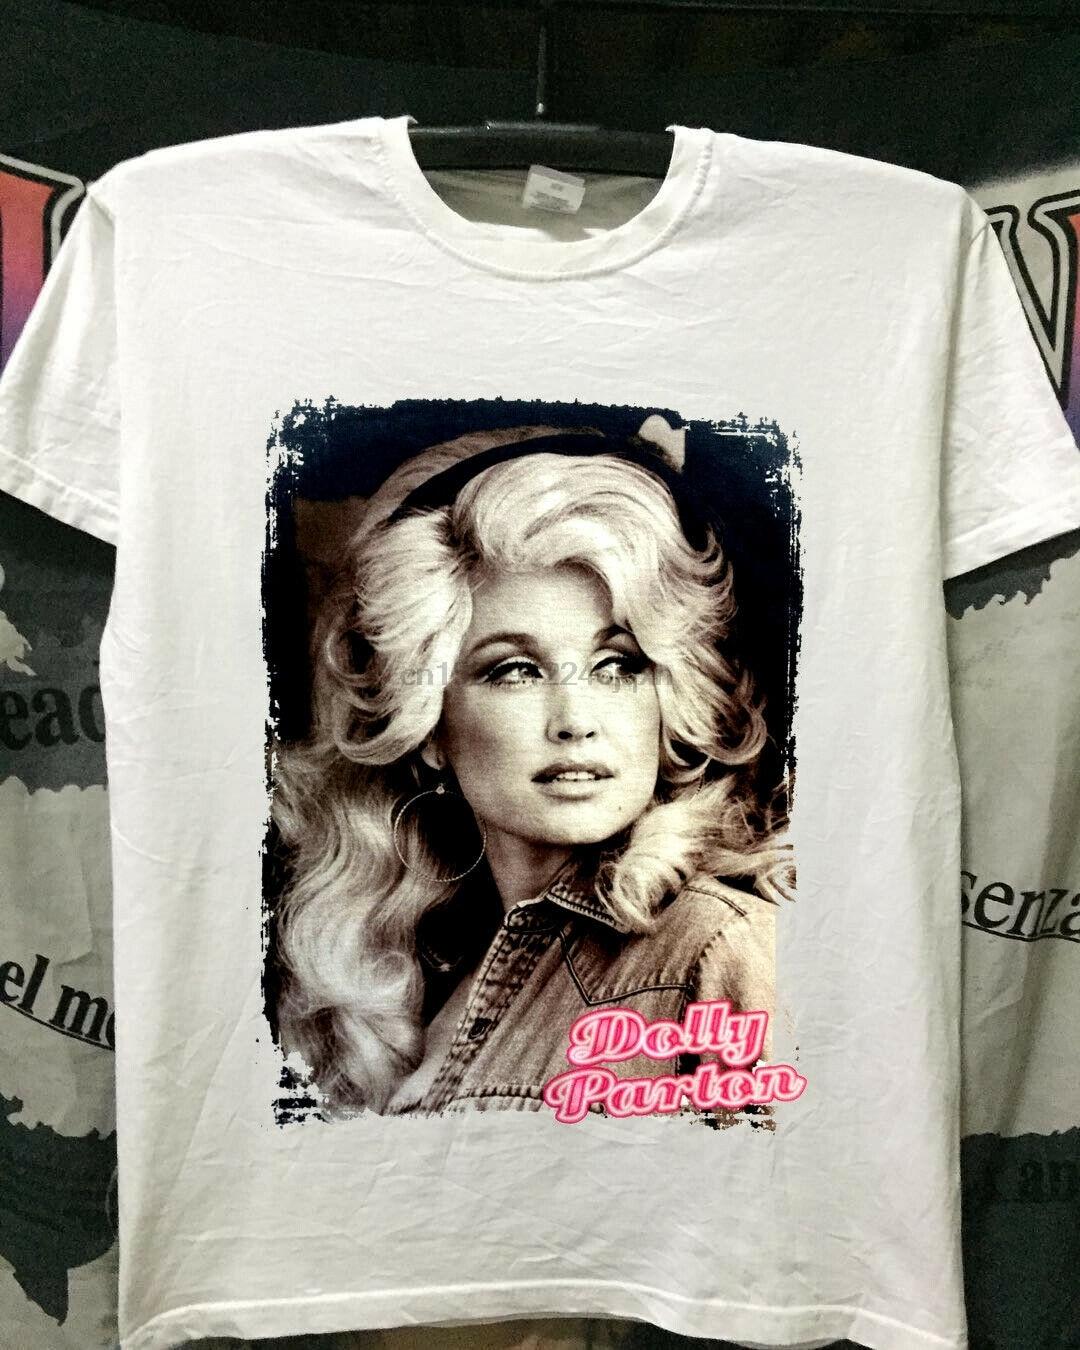 Hot Rame Rare Dolly Parton Country Music Tour New Reprint Tshirt Usa Size